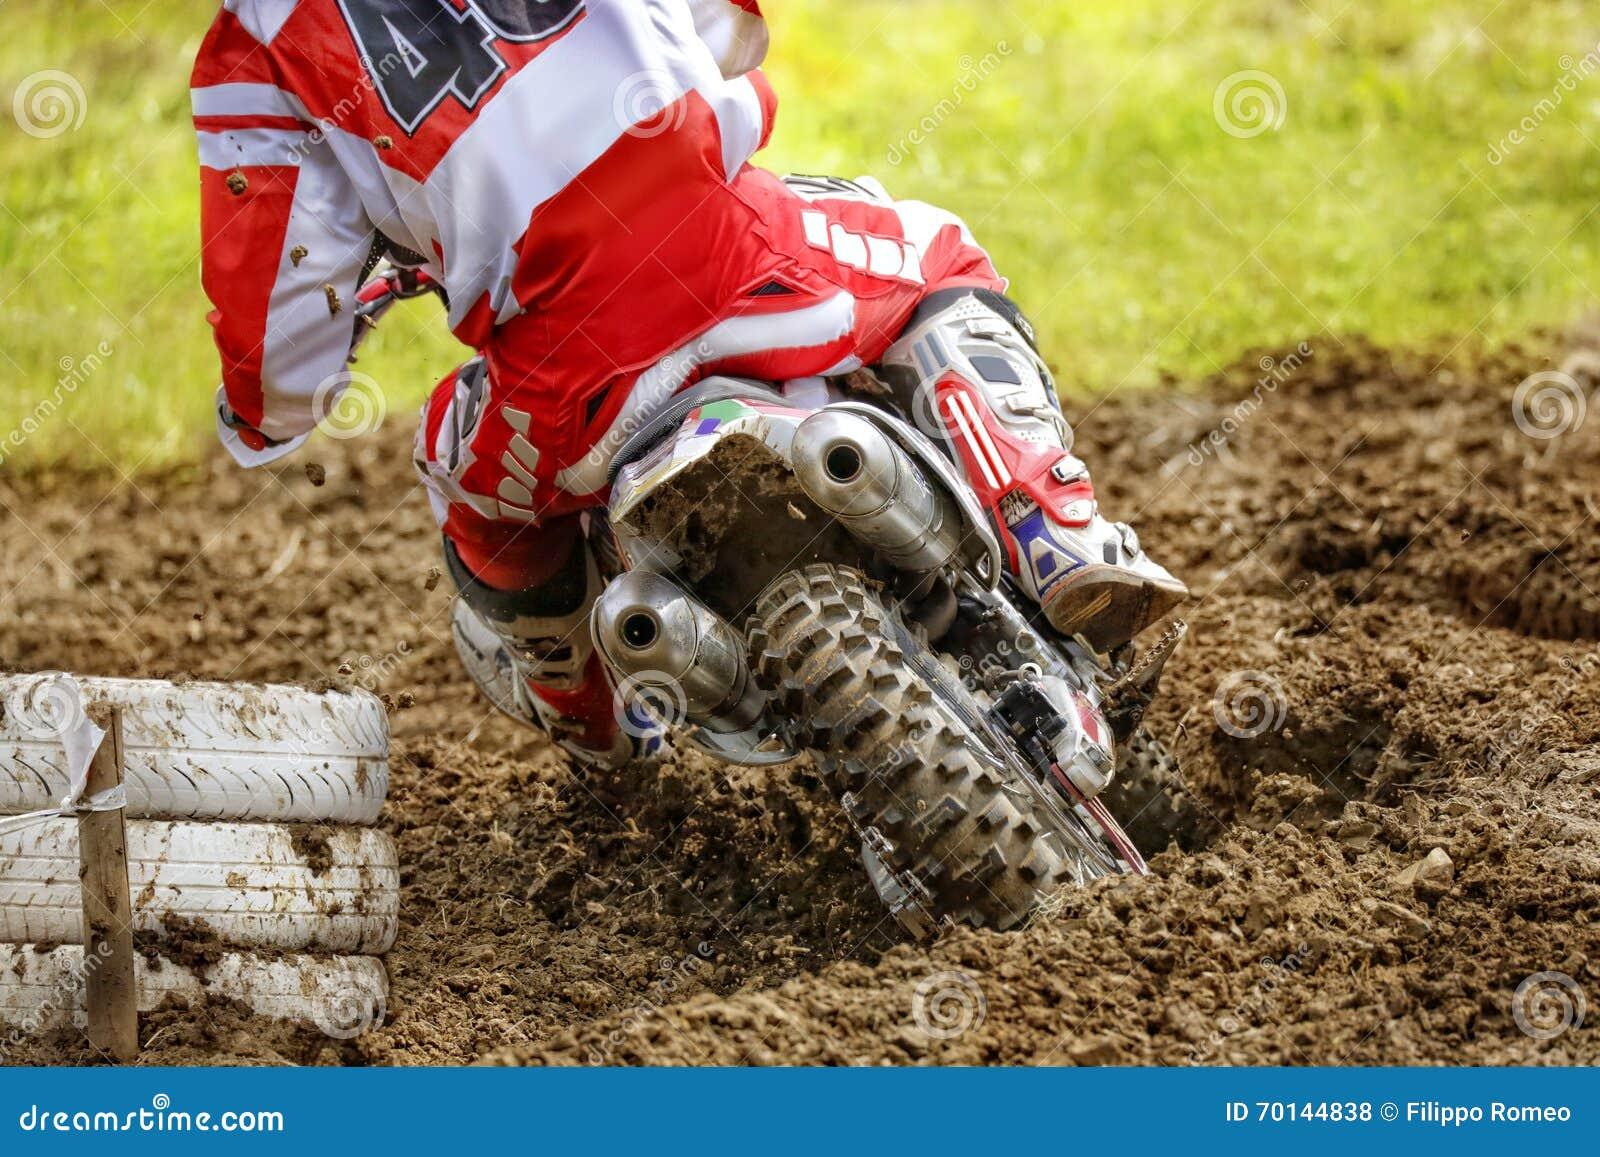 Enduro Bike Rider On Dirt Track Stock Photo - Image of